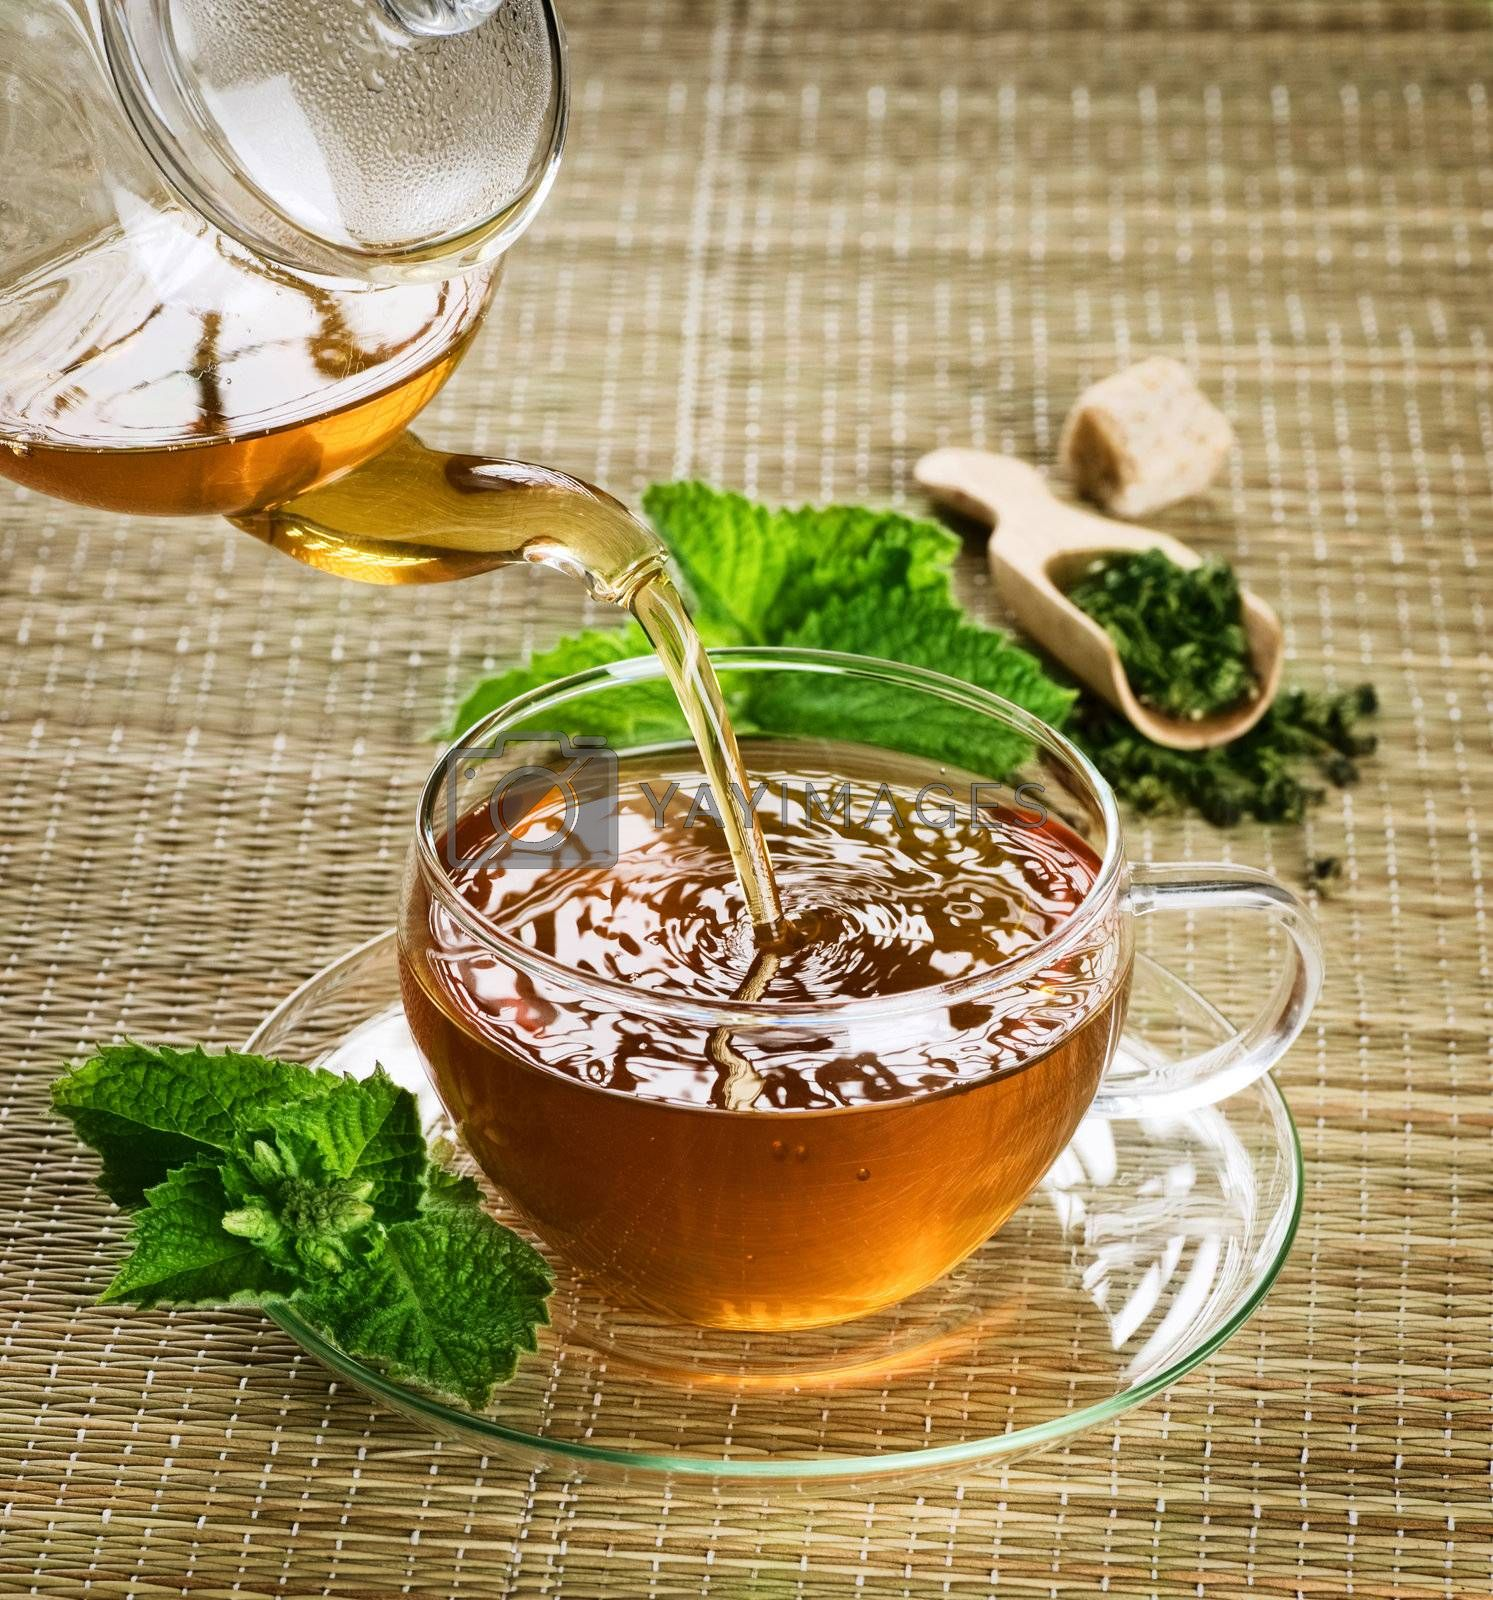 Healthy Tea by Subbotina Anna